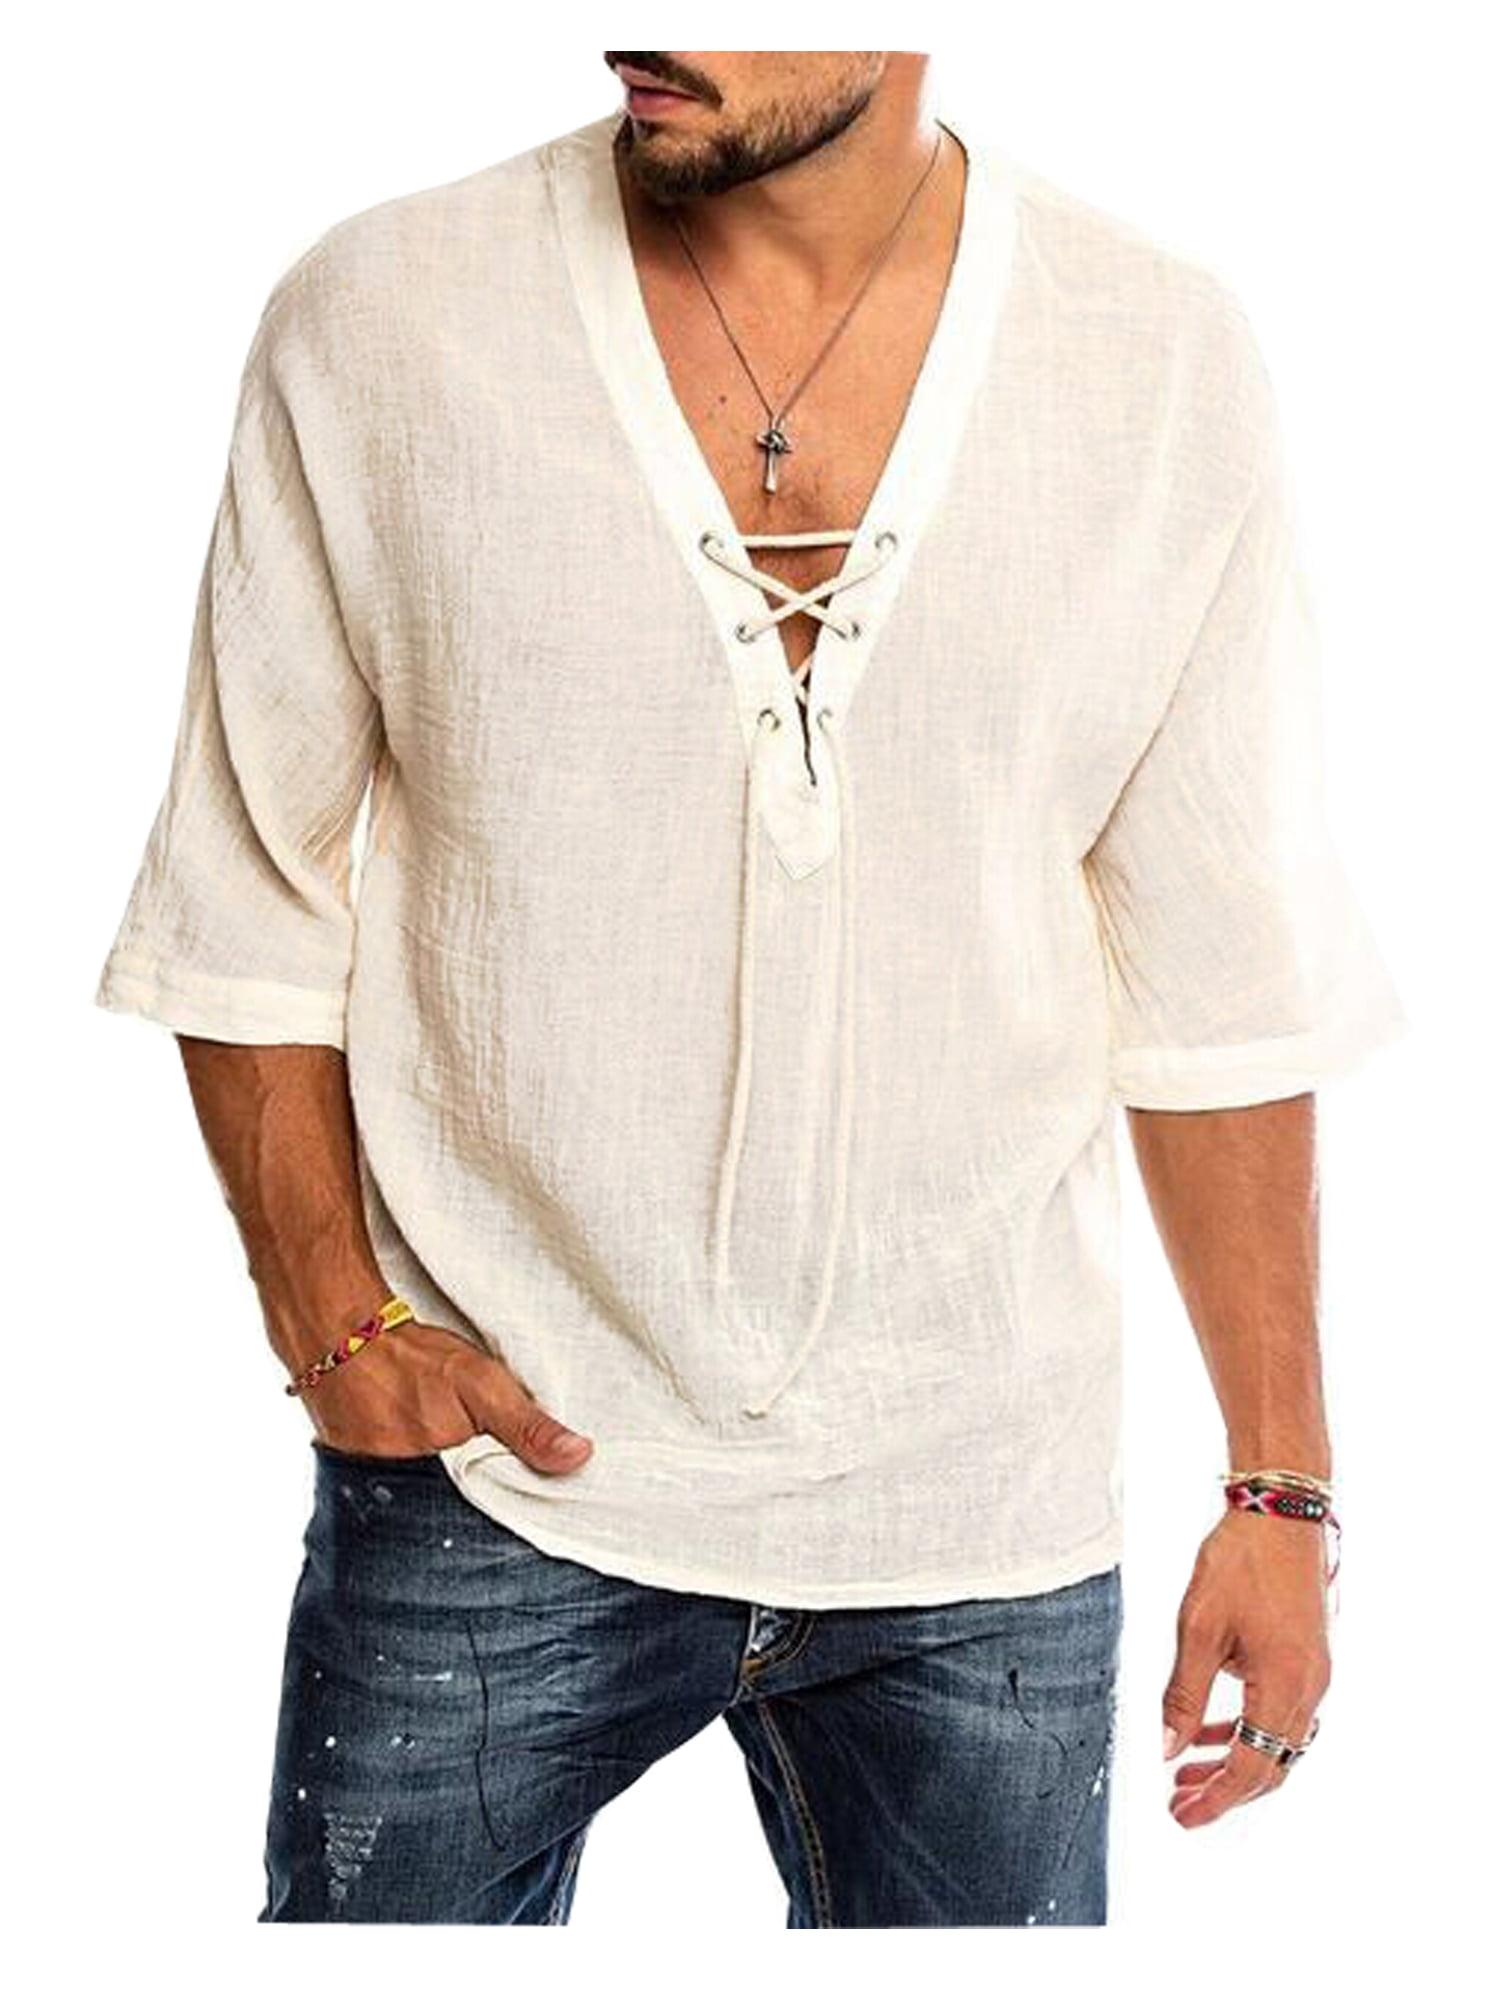 Men Baggy Cotton Linen Solid Pocket Short Sleeve V-Neck T Shirt  Blouses M-3XL